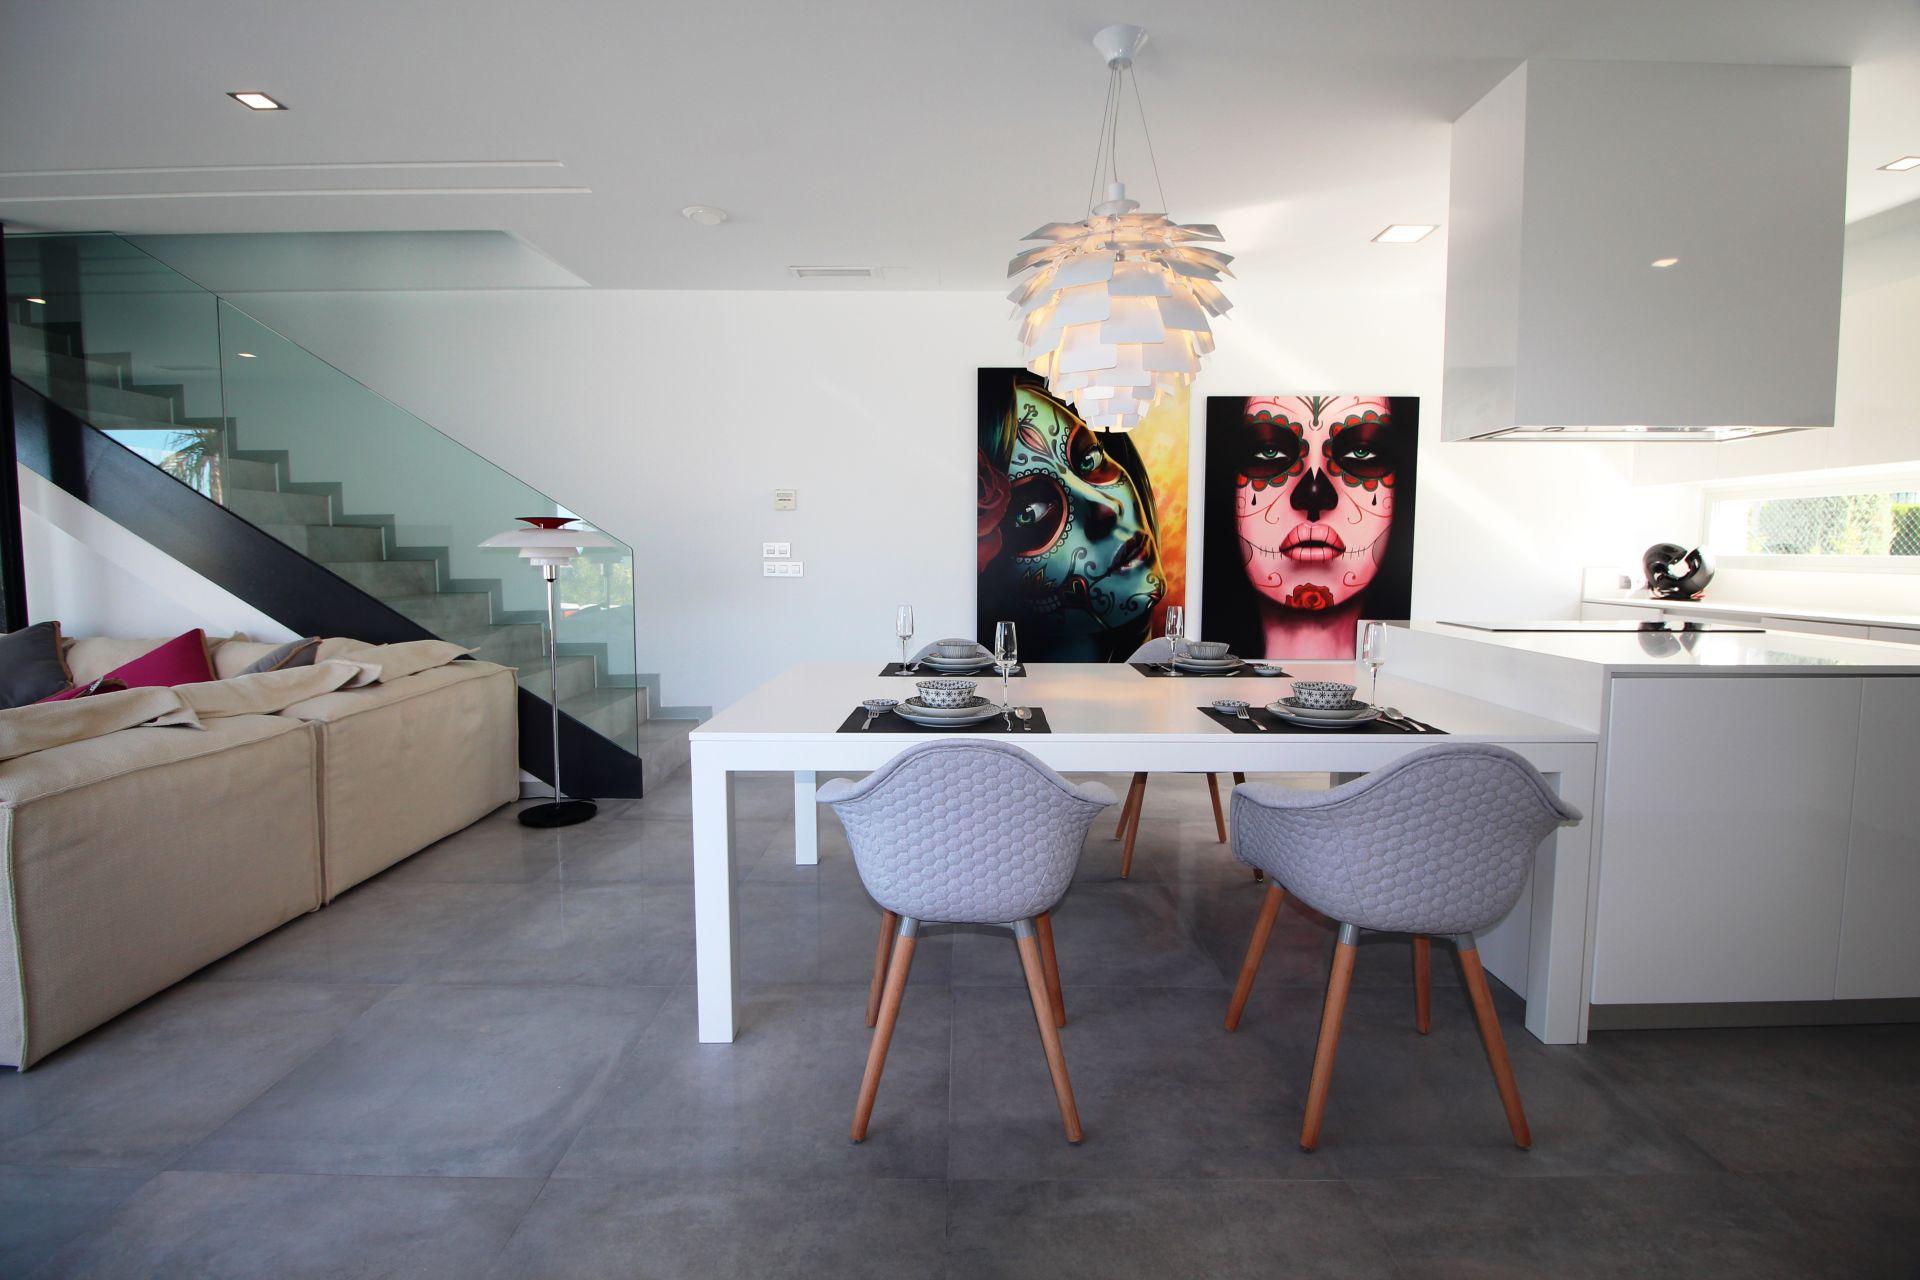 Exclusive villas with 3 bedrooms in Finestrat 5